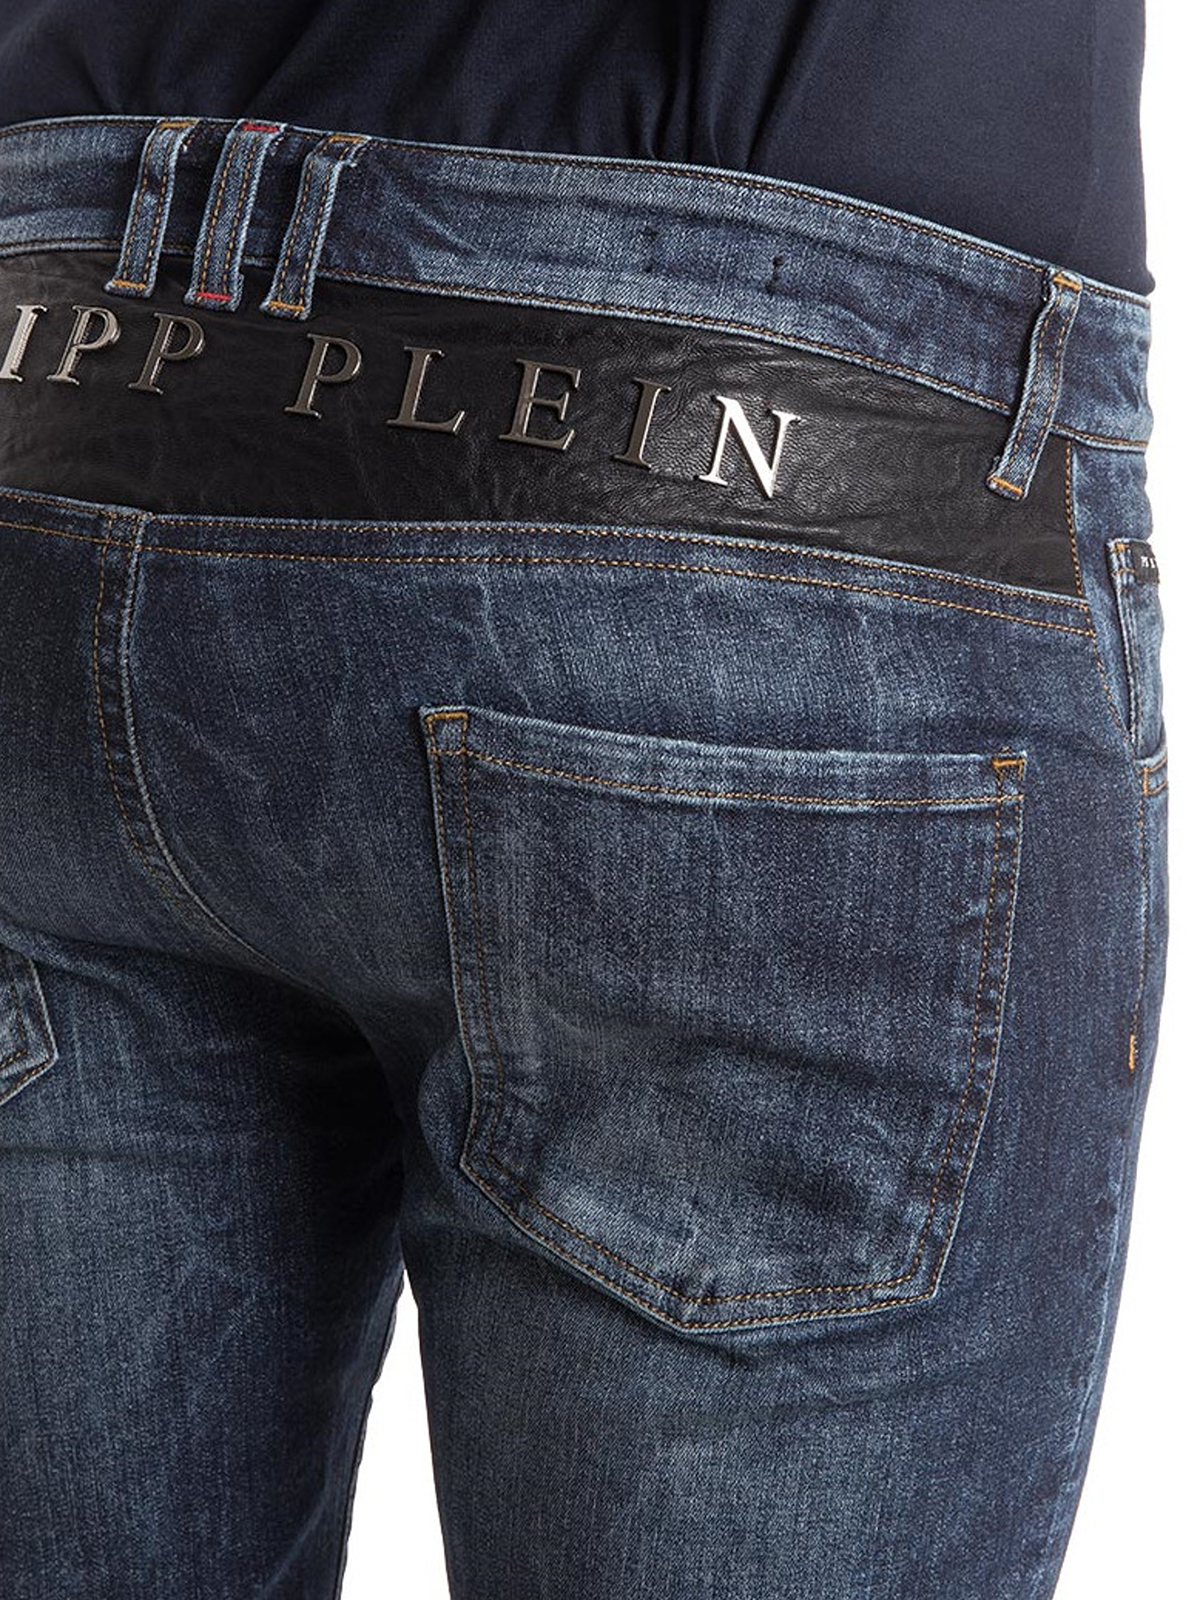 jeans yusuke con logo lettering philipp plein jeans dritti a sigaretta ikrix. Black Bedroom Furniture Sets. Home Design Ideas